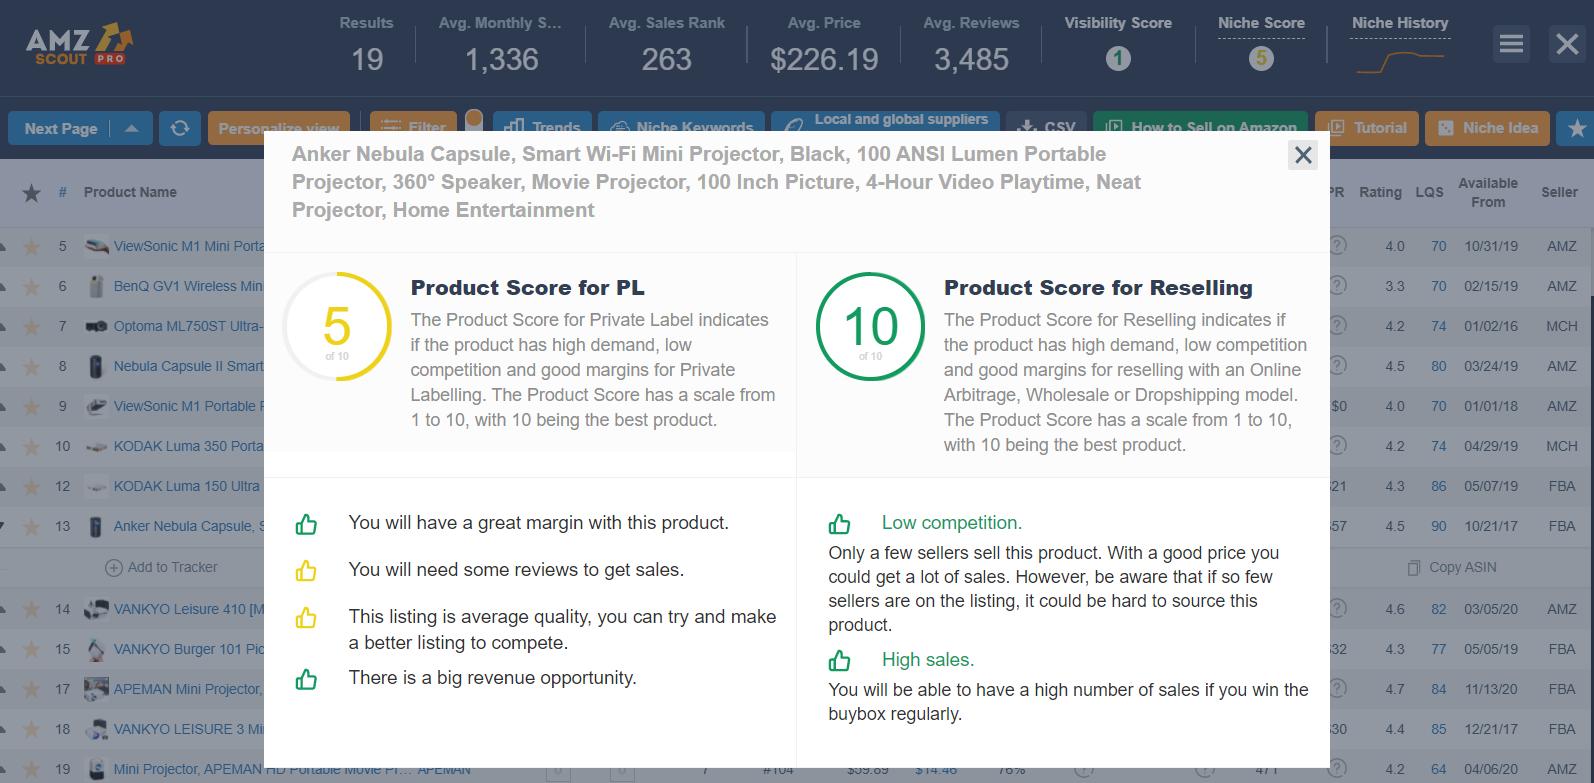 amz-scout-product-score